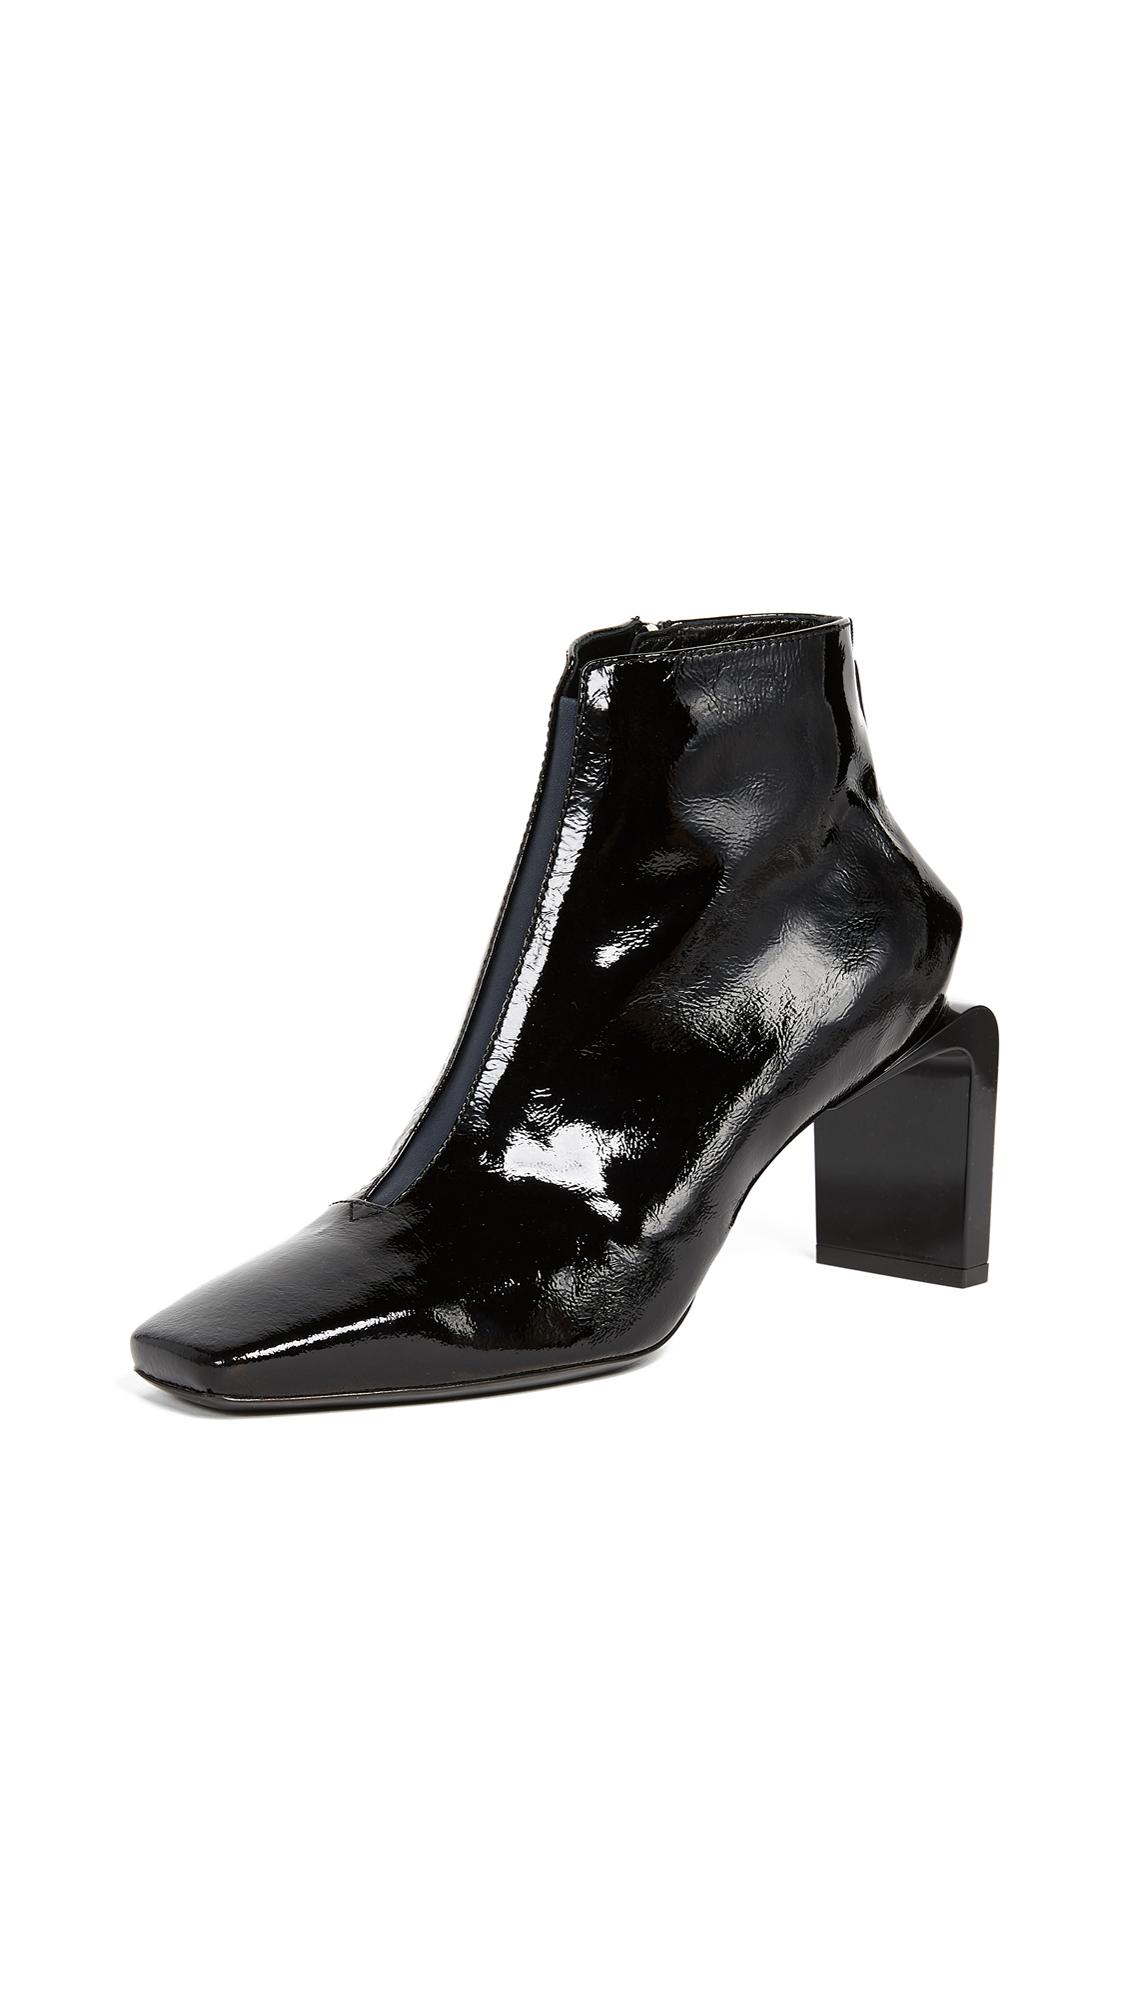 KENZO Shasta Heeled Booties - Black